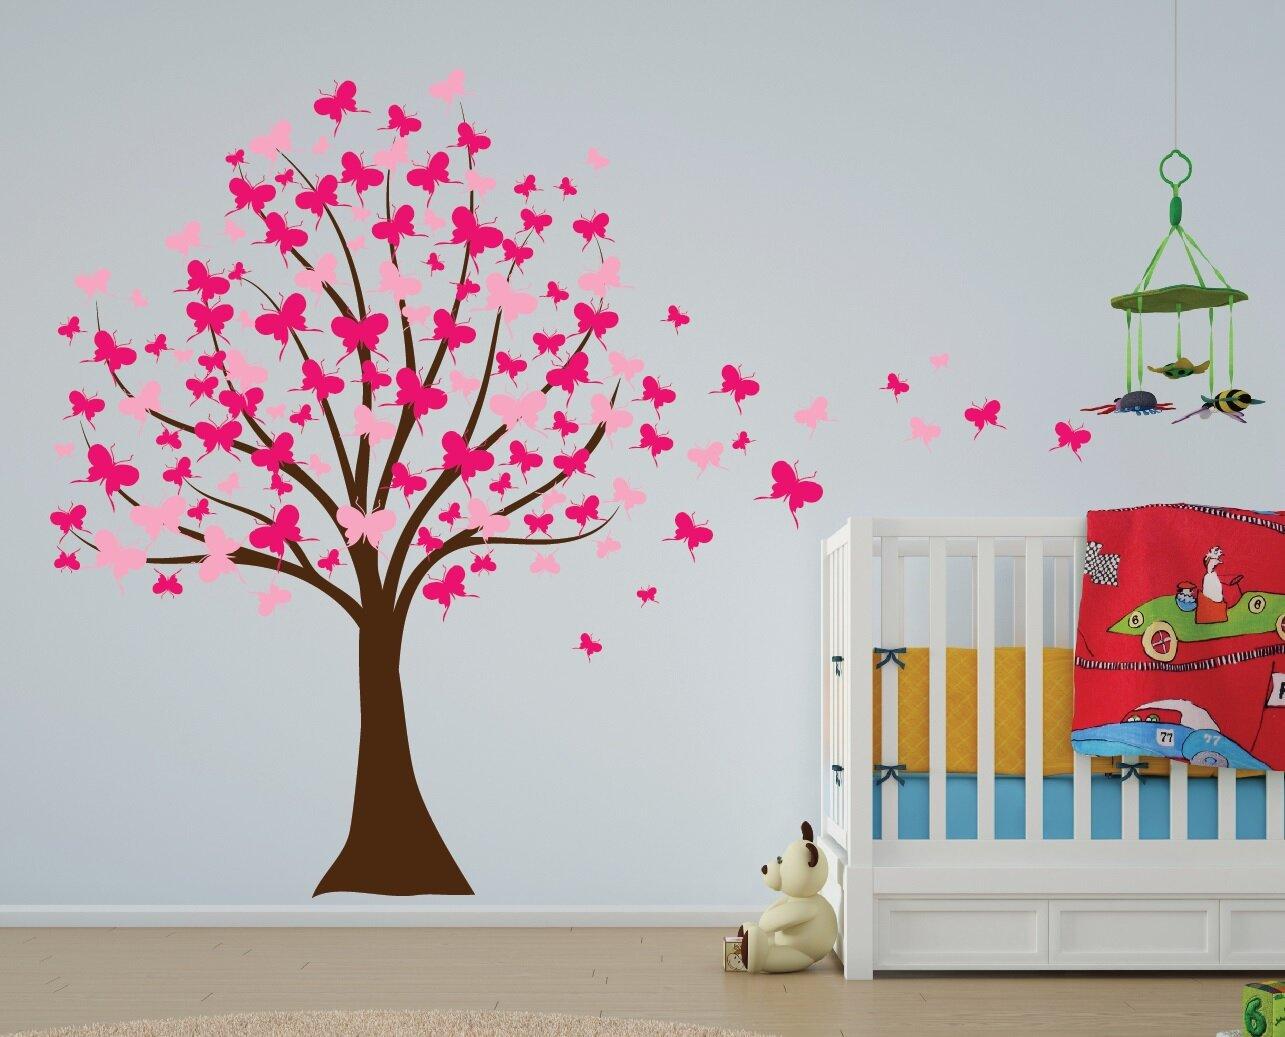 Innovative stencils butterfly cherry blossom tree baby for Cherry blossom wall mural stencil